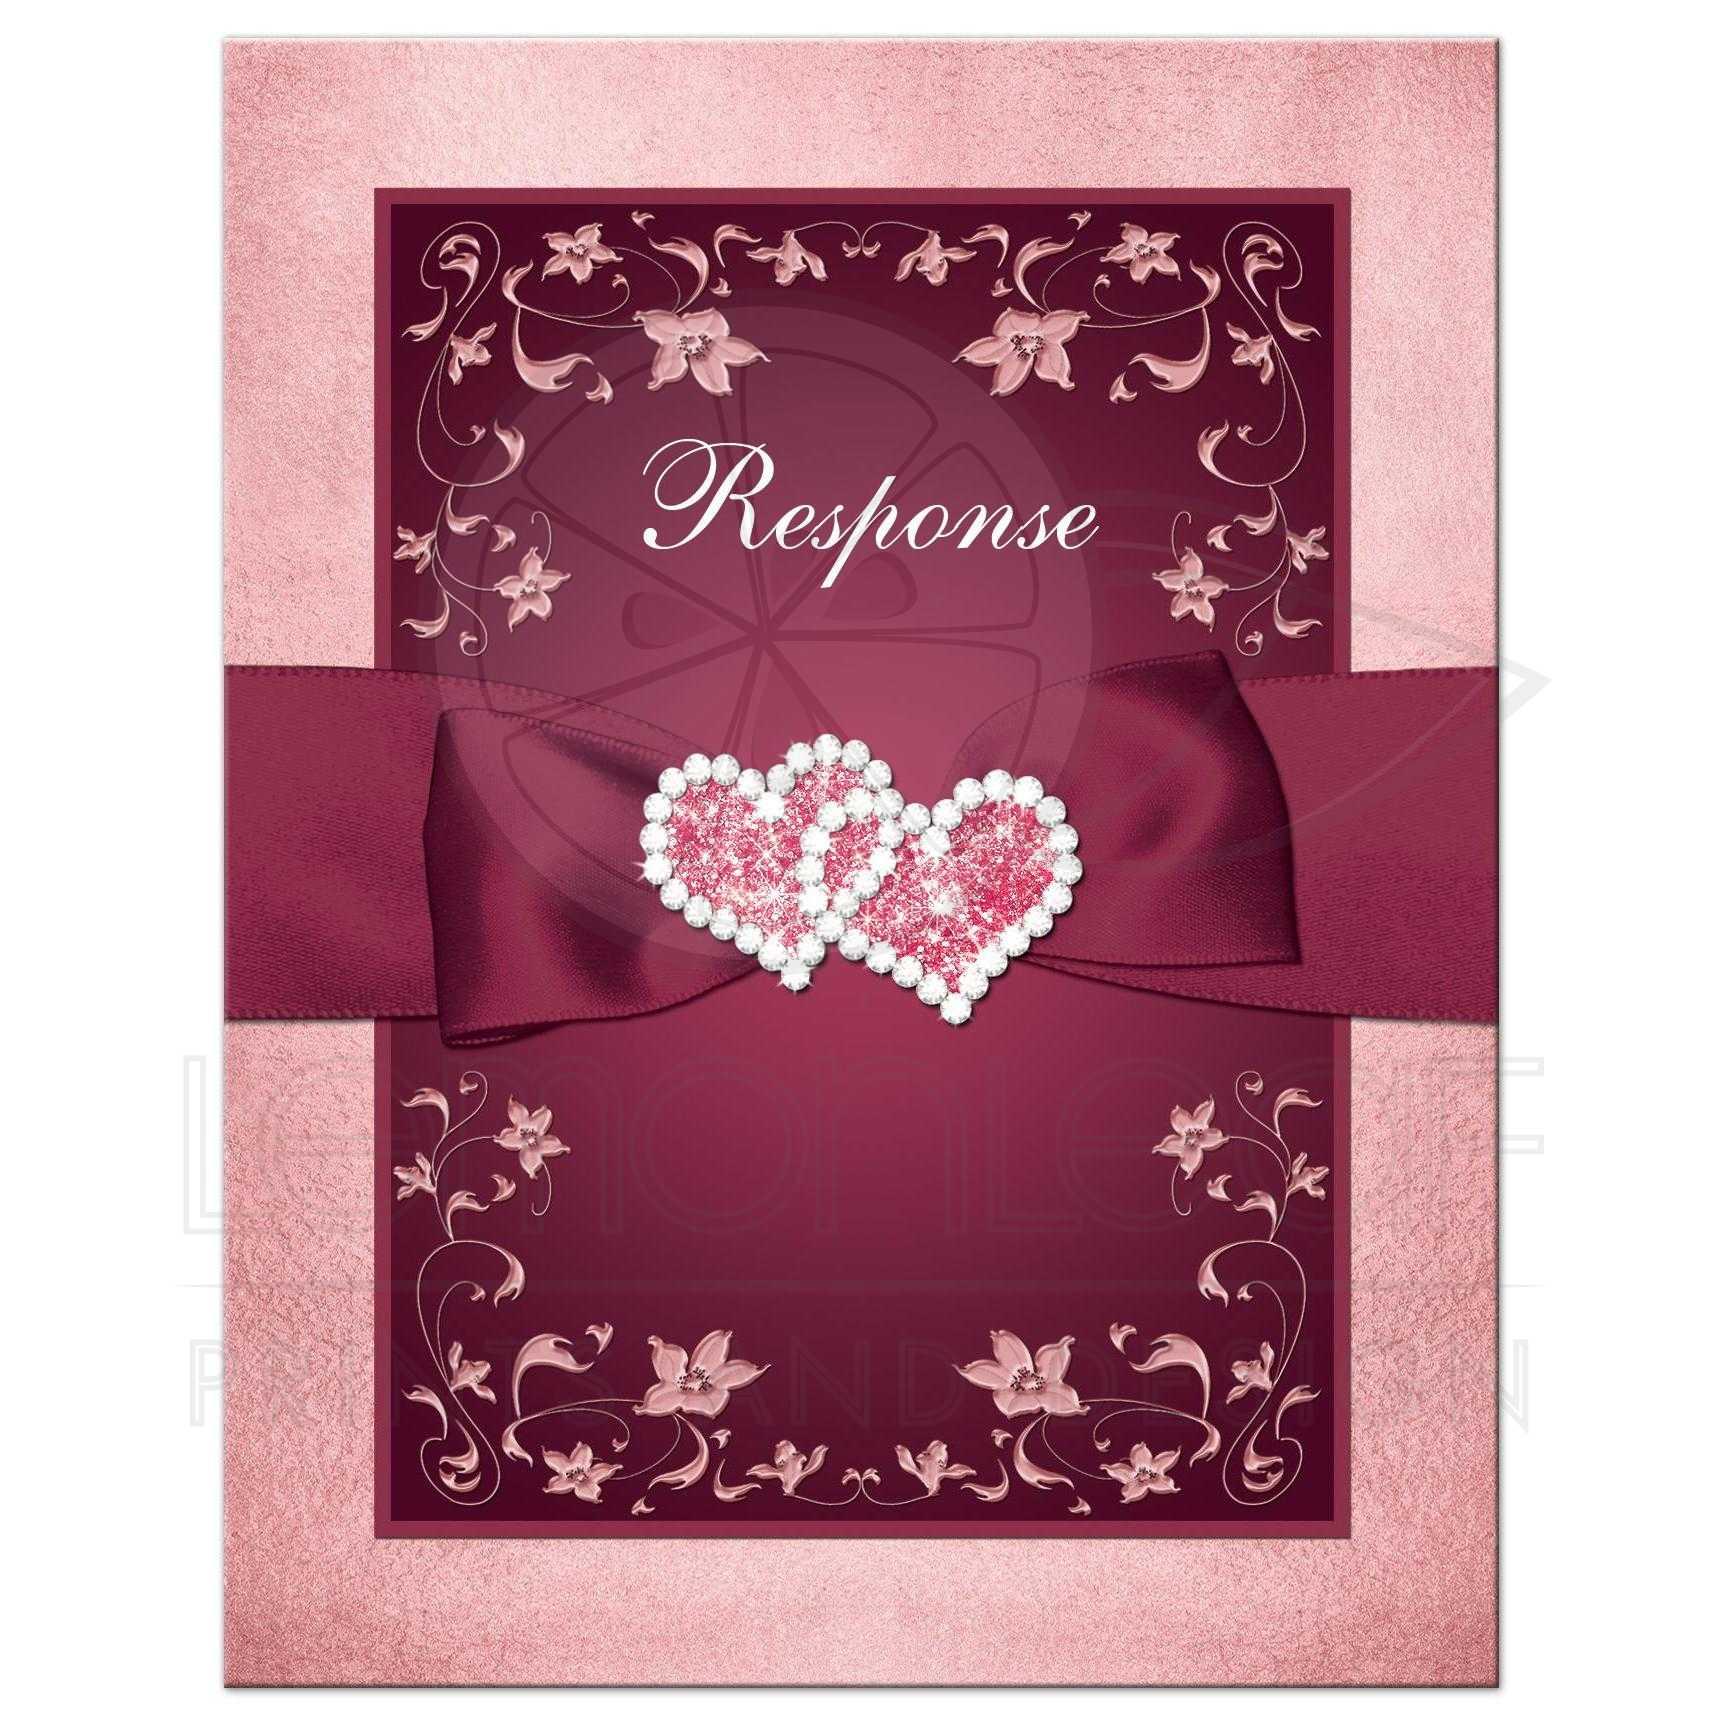 Burgundy, Blush Wedding Response Card   Flowers, Scrolls - Printed ...